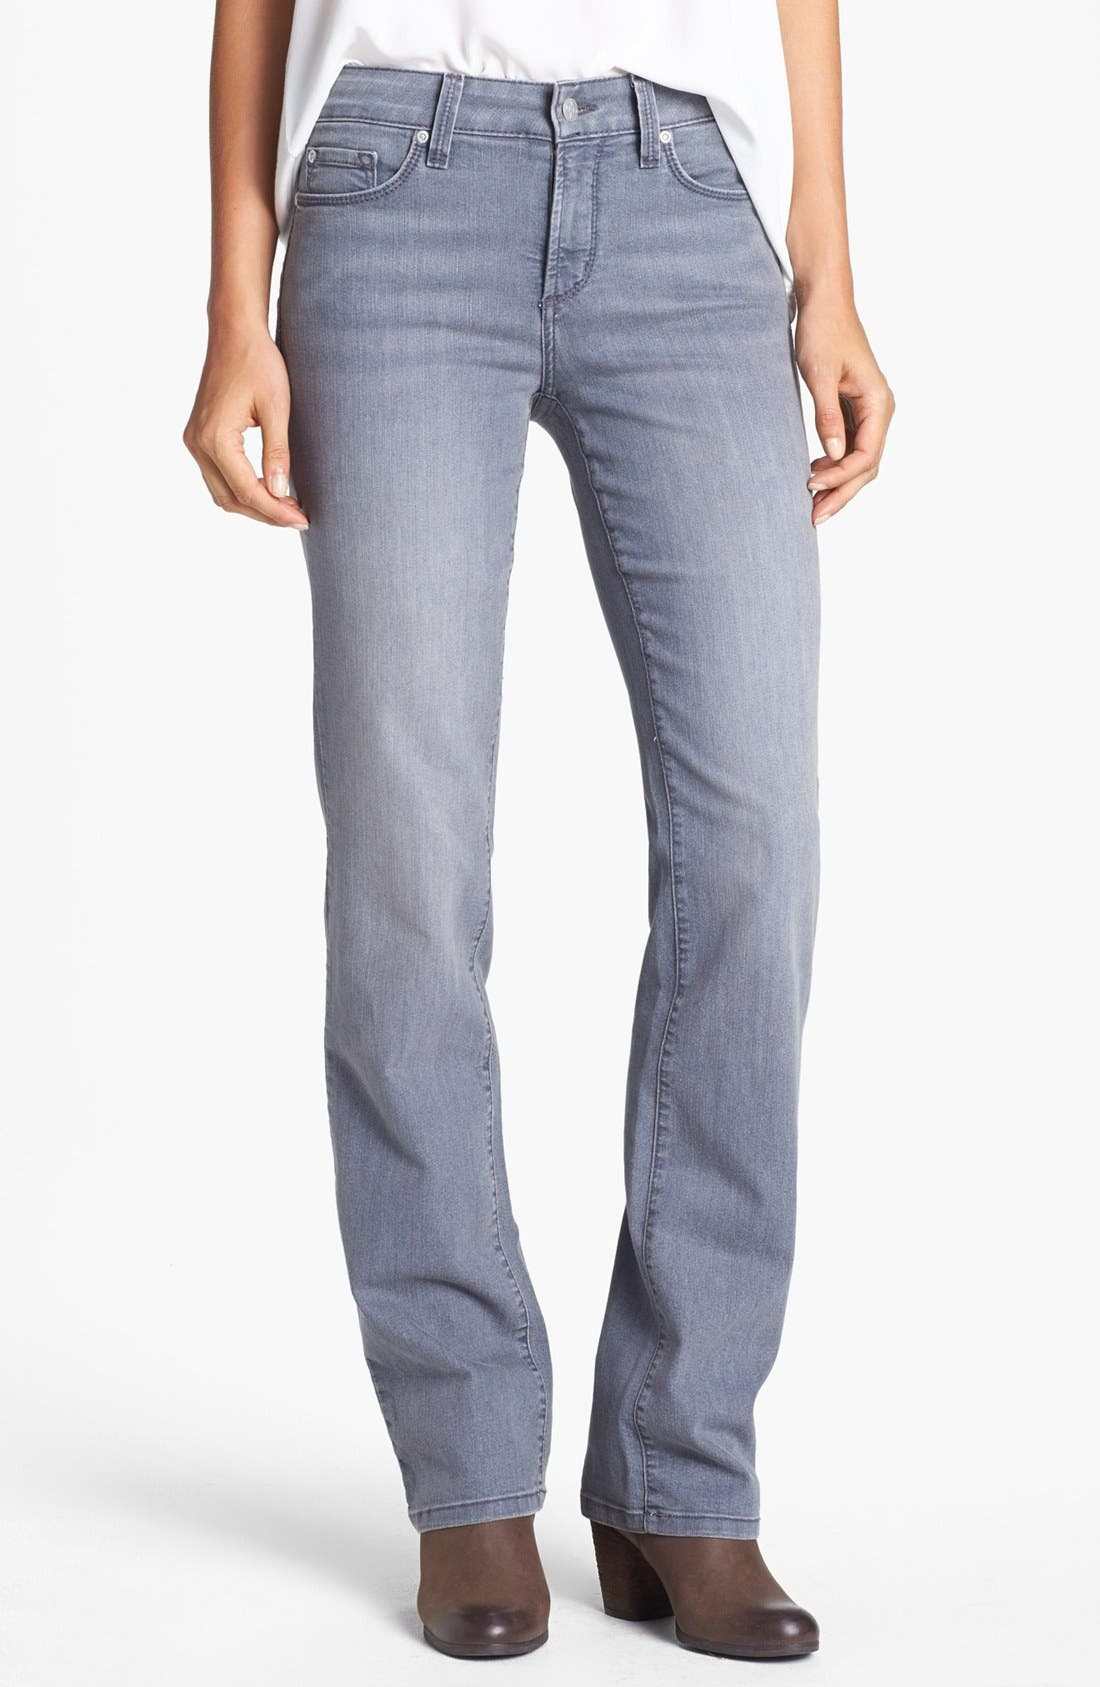 Alternate Image 1 Selected - NYDJ 'Marilyn' Straight Leg Jeans (Grey) (Petite)